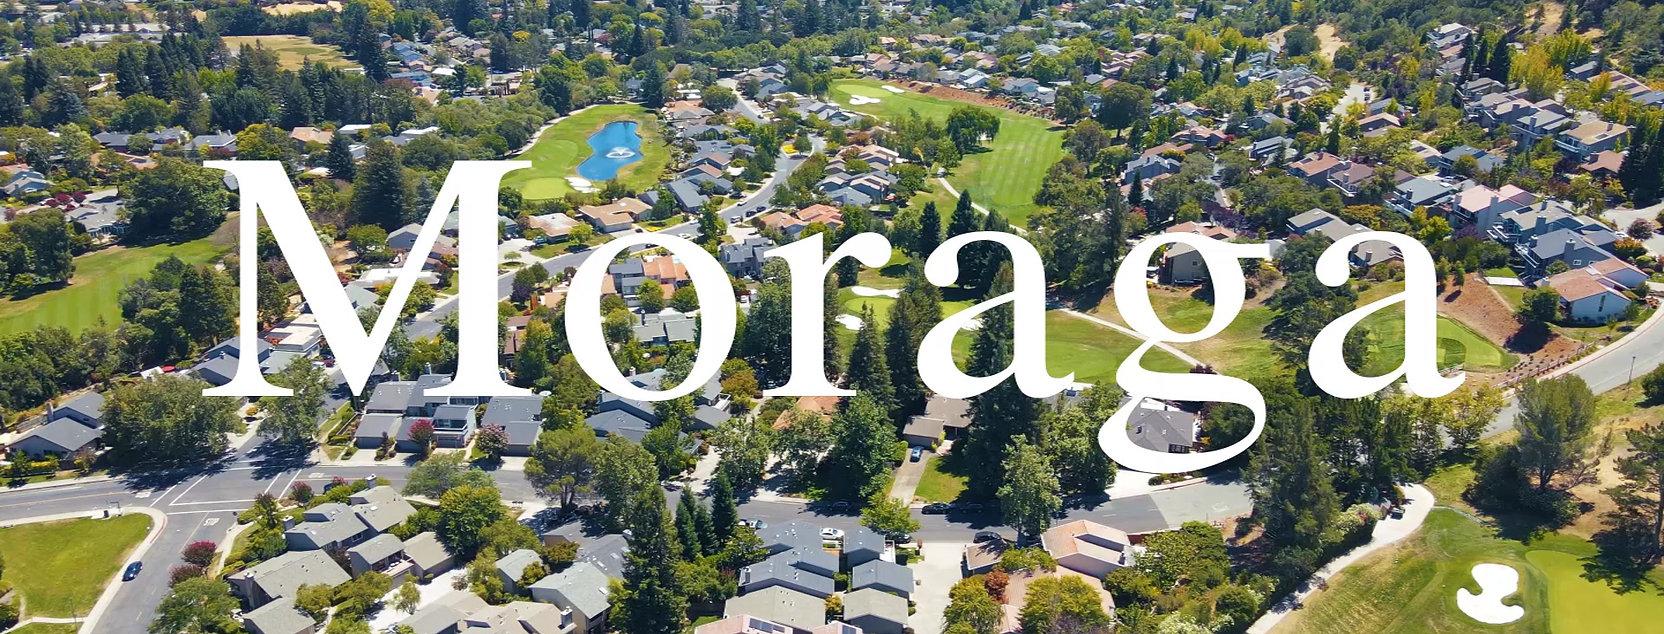 Orinda Moraga Lafayette East Bay Molly Smith Top Agent Real Estate Village Associates Dana Green Ann Sharf Clark Thompson Amy Smith